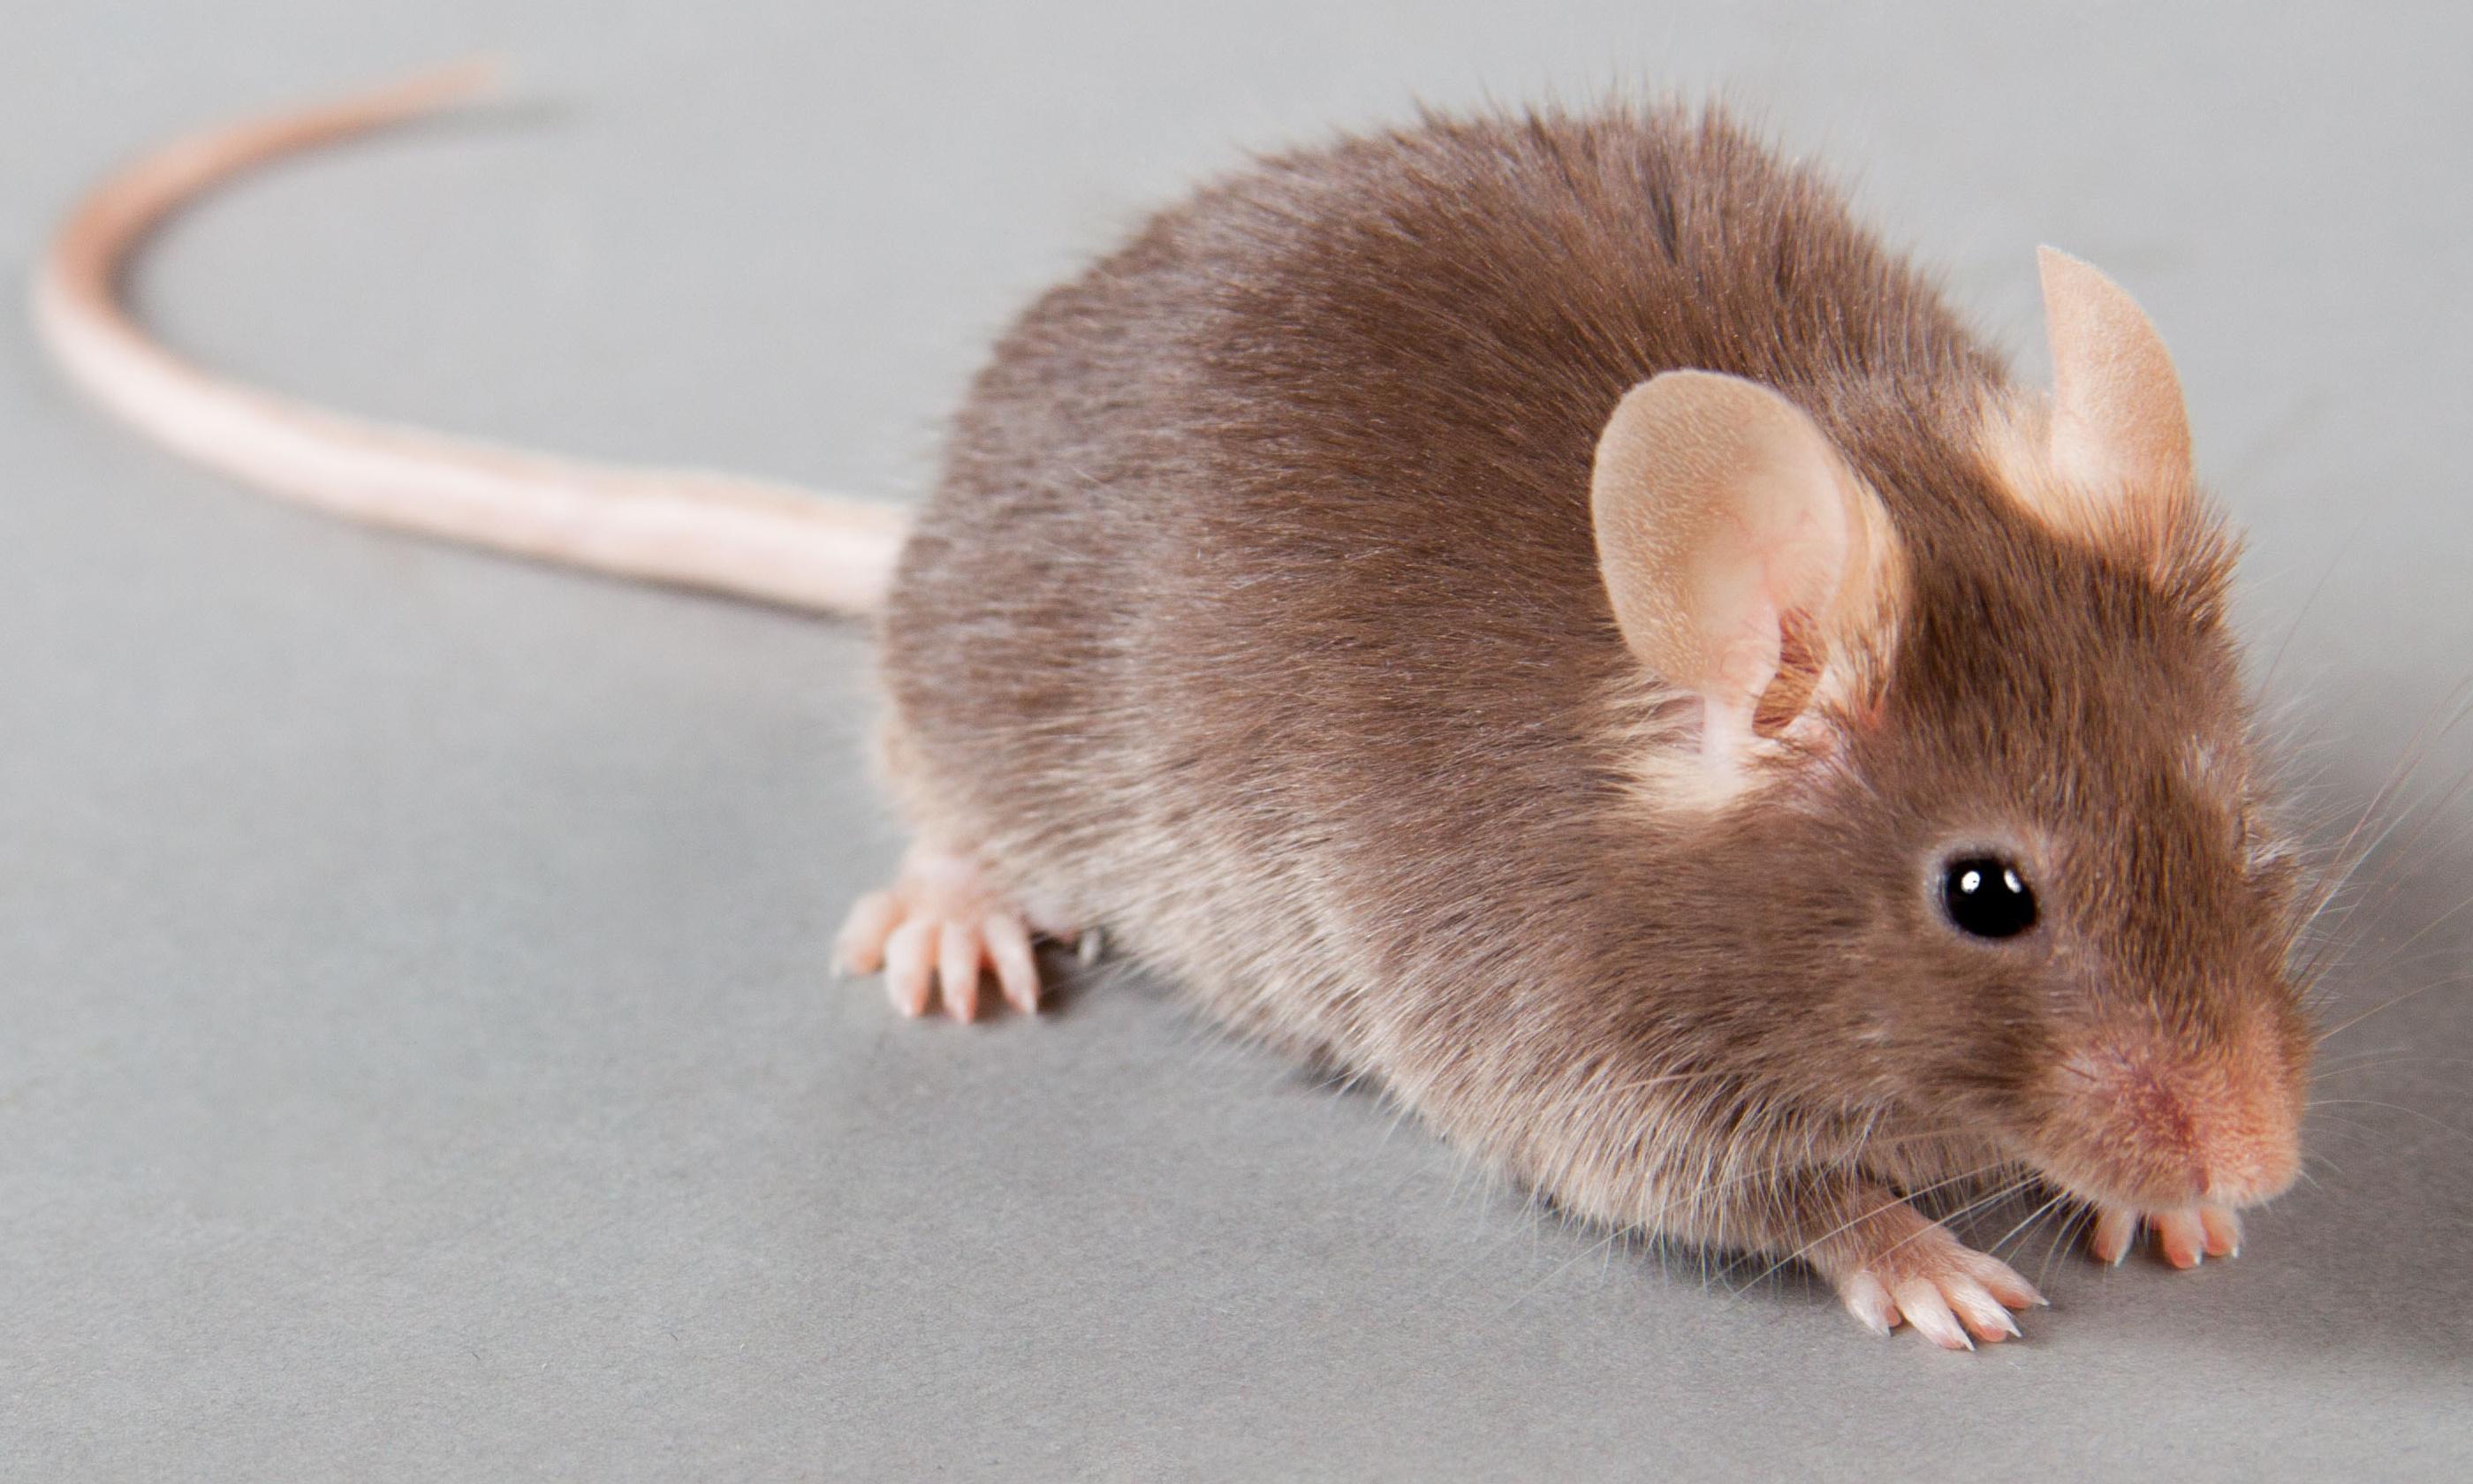 Scientists rewrite mice DNA so genes can be spread through species